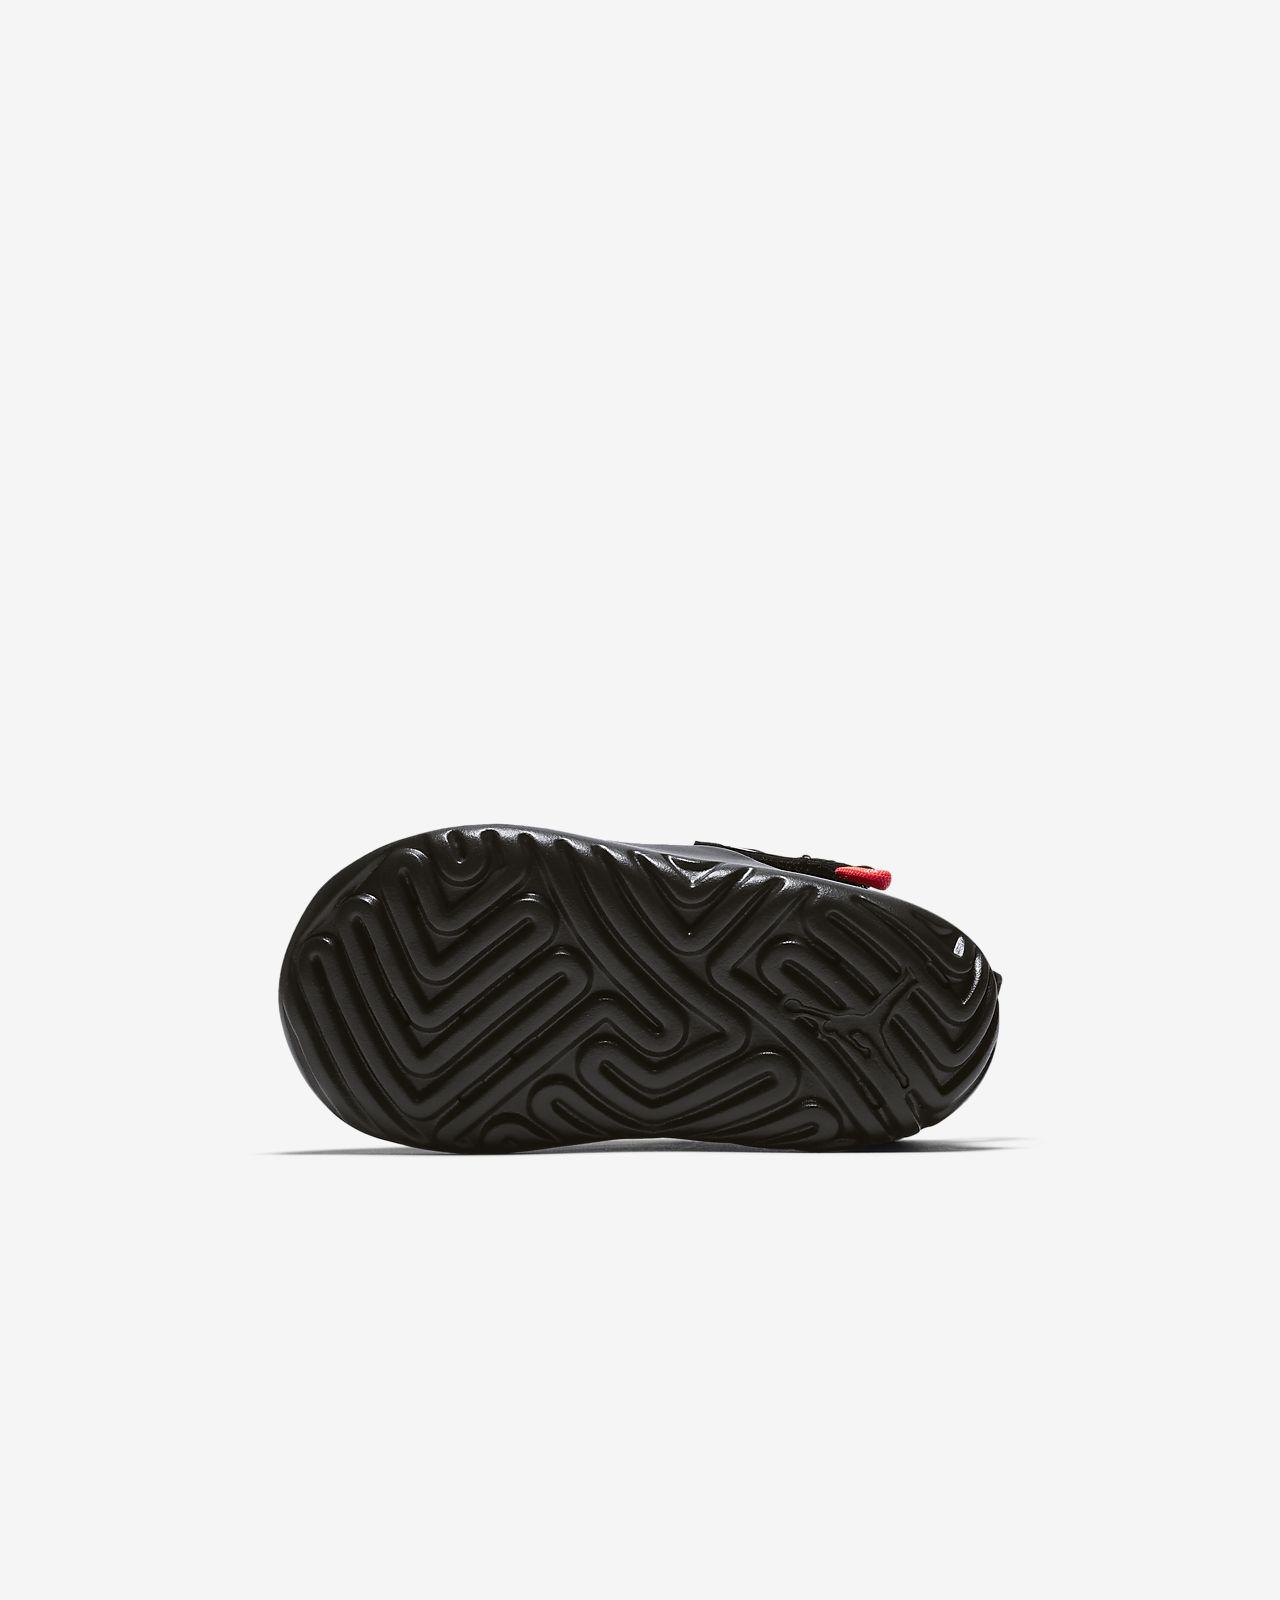 e9a8ad0bf131 Jordan Proto 23 Baby  amp  Toddler Shoe. Nike.com IN